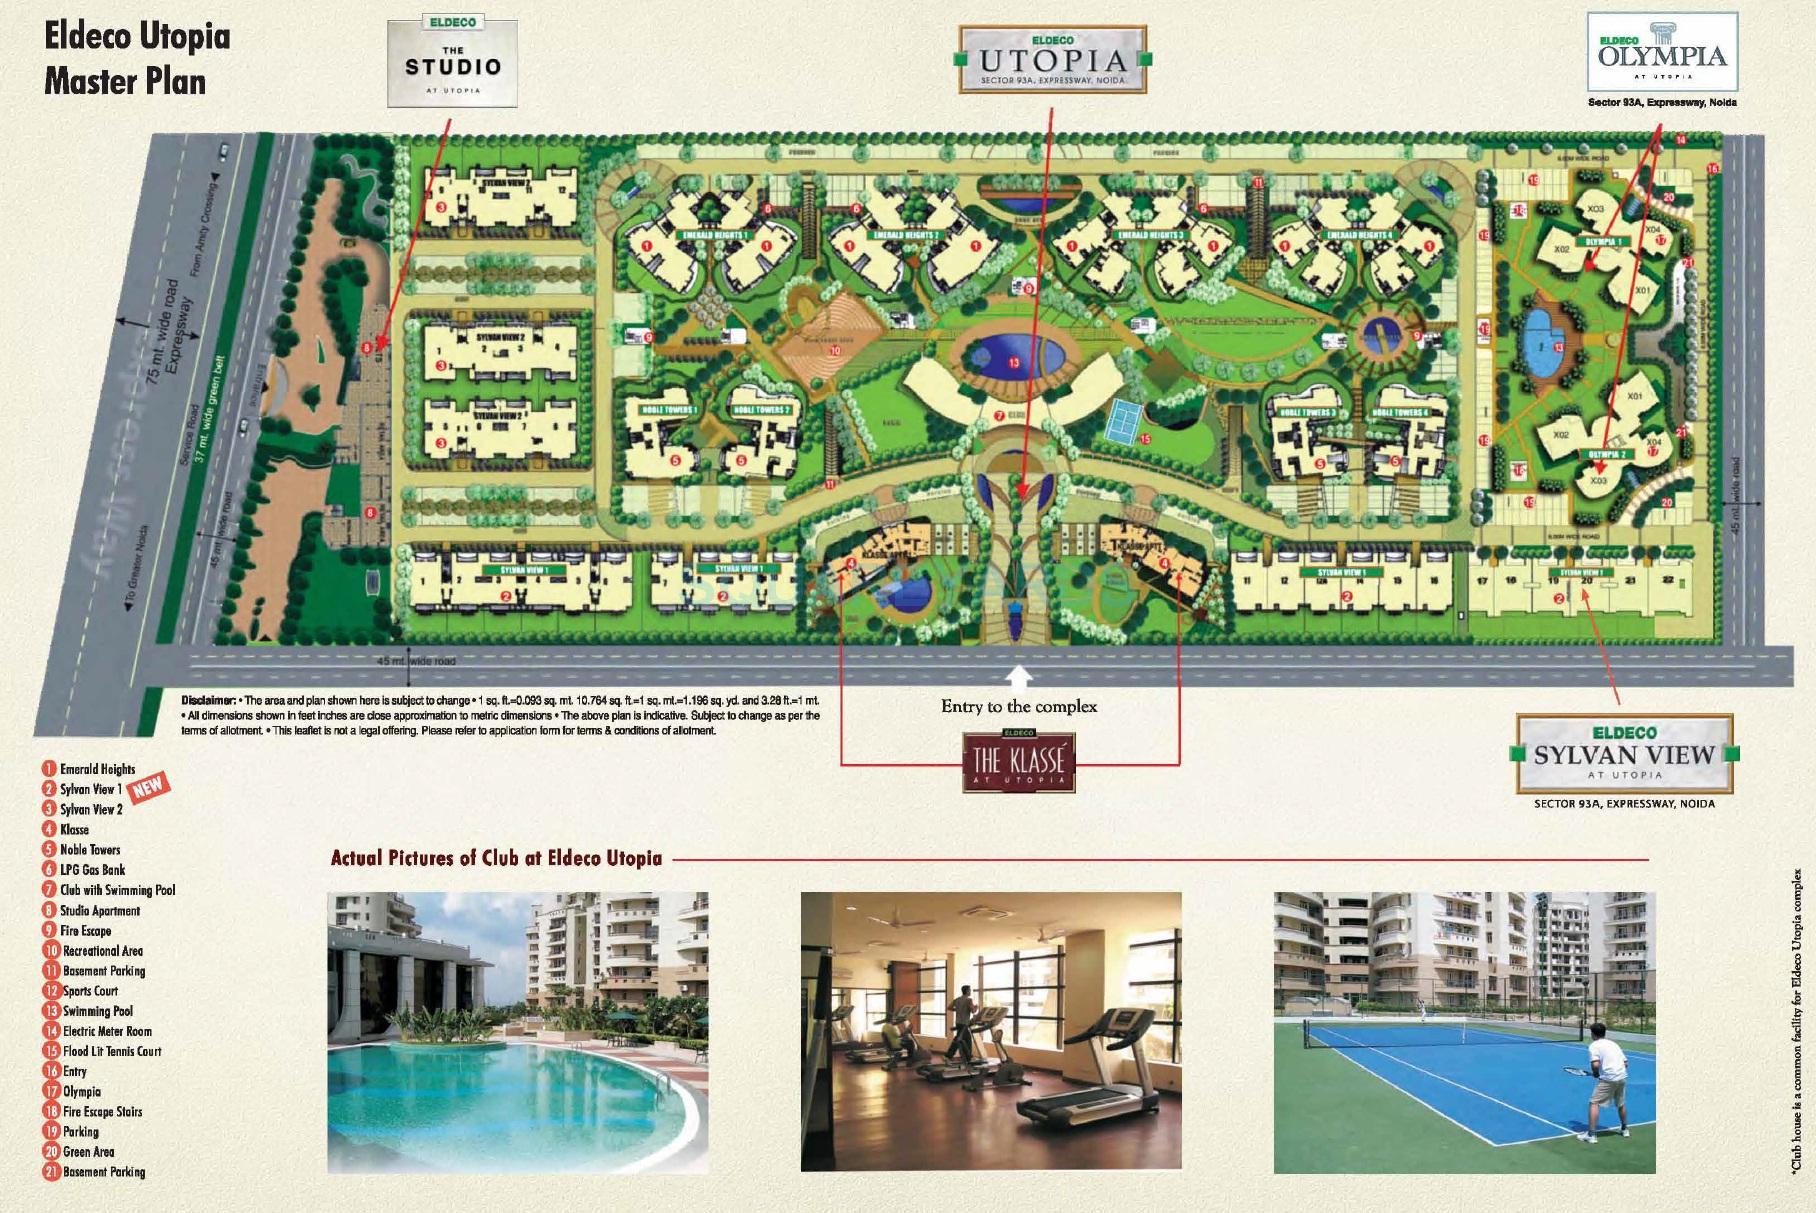 eldeco sylvan view master plan image1